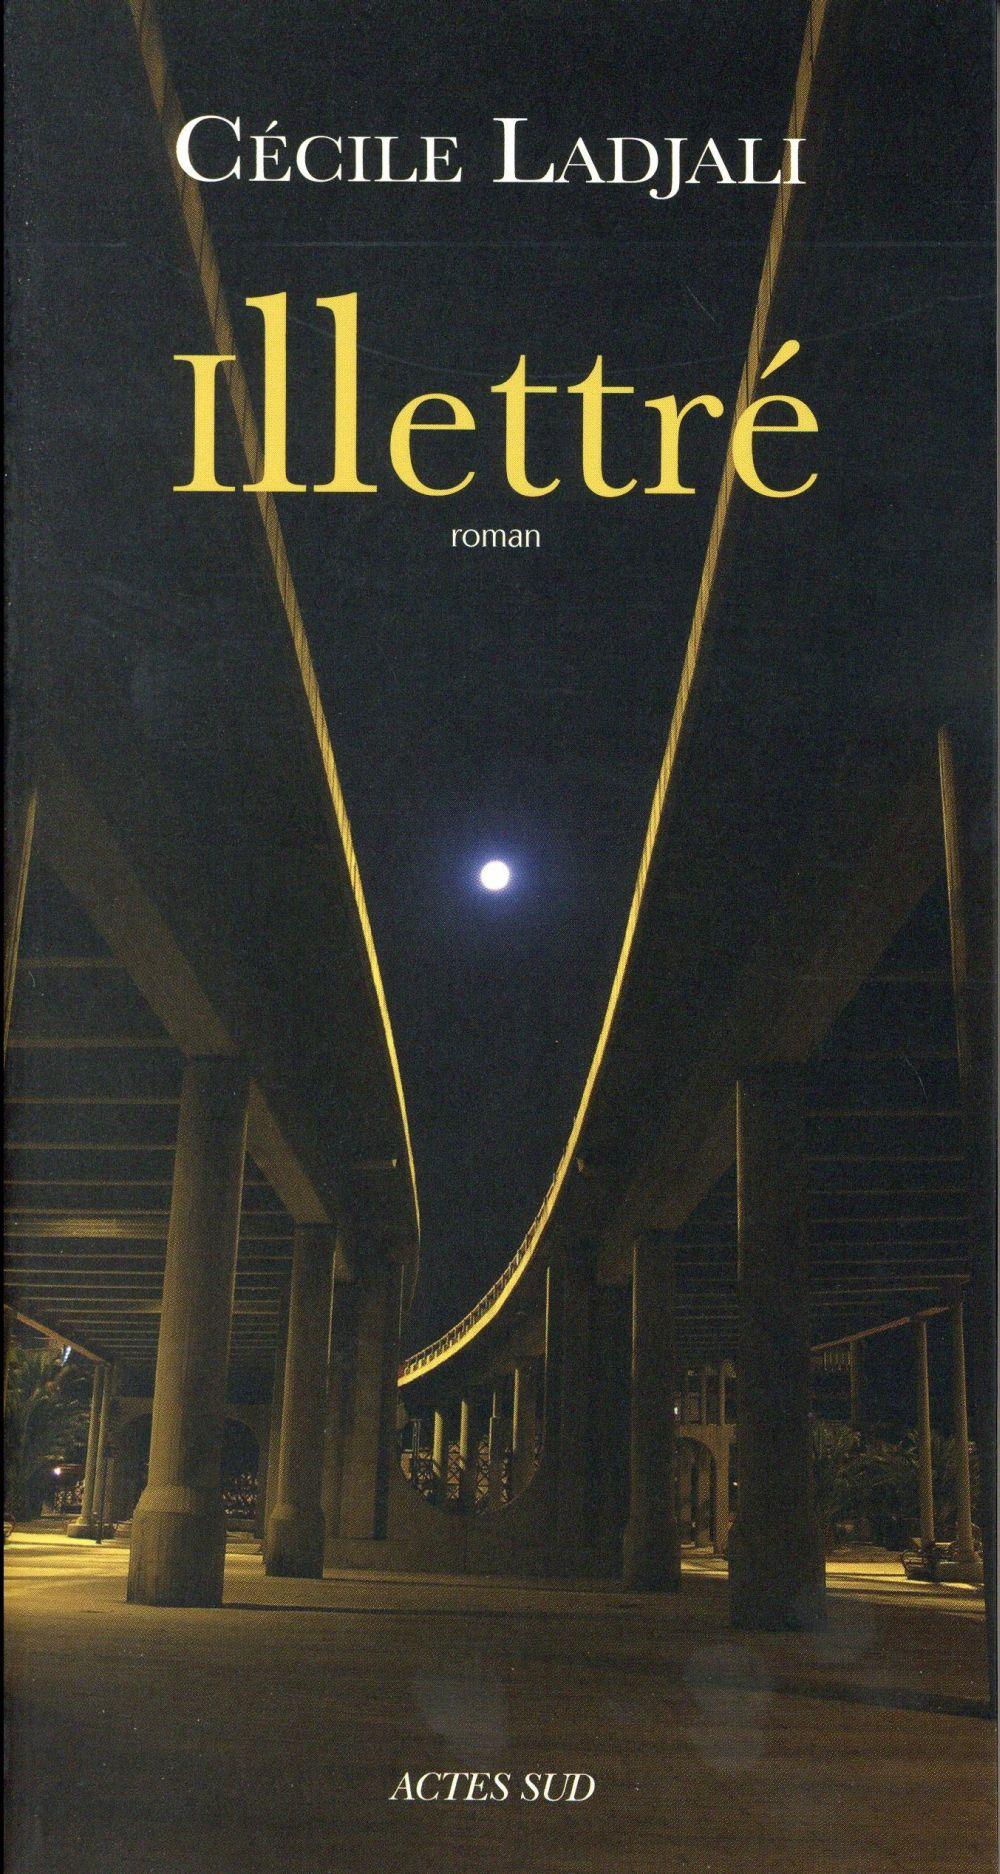 Illettré : roman / Cécile Ladjali | Ladjali, Cécile